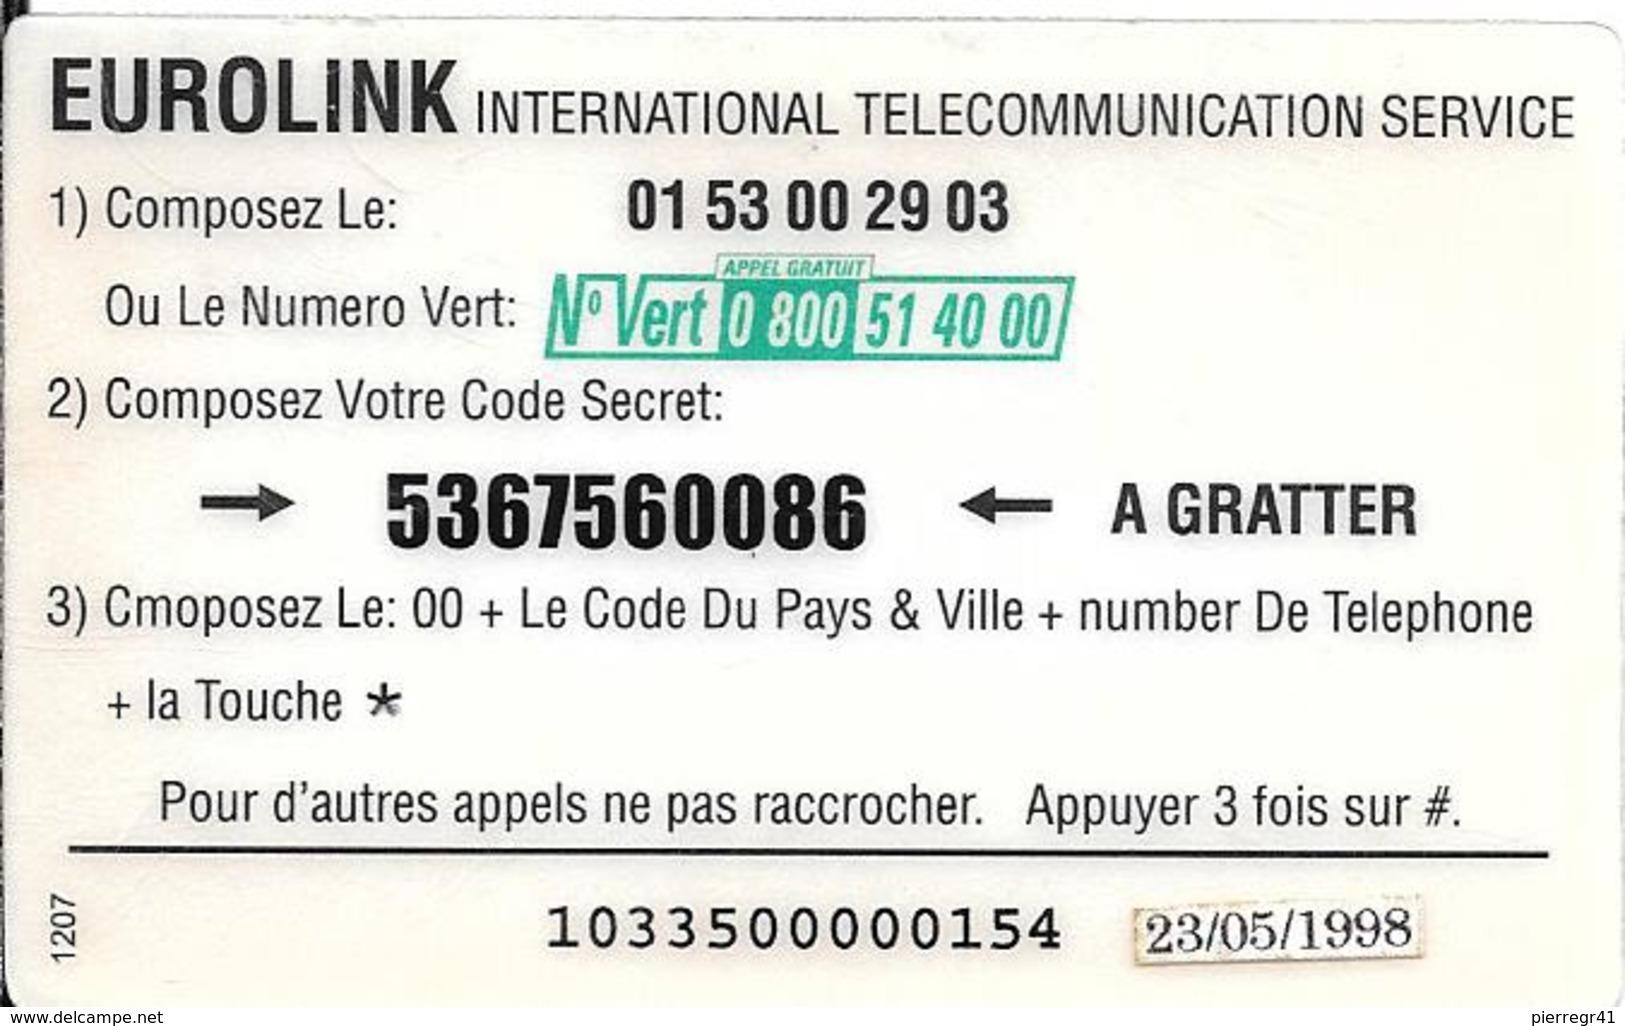 CARTE-PREPAYEE-100FF-EUROLINK-MONTAGNE-V° Autocollant Daté 23/05/1998-T BE     - - Andere Voorafbetaalde Kaarten